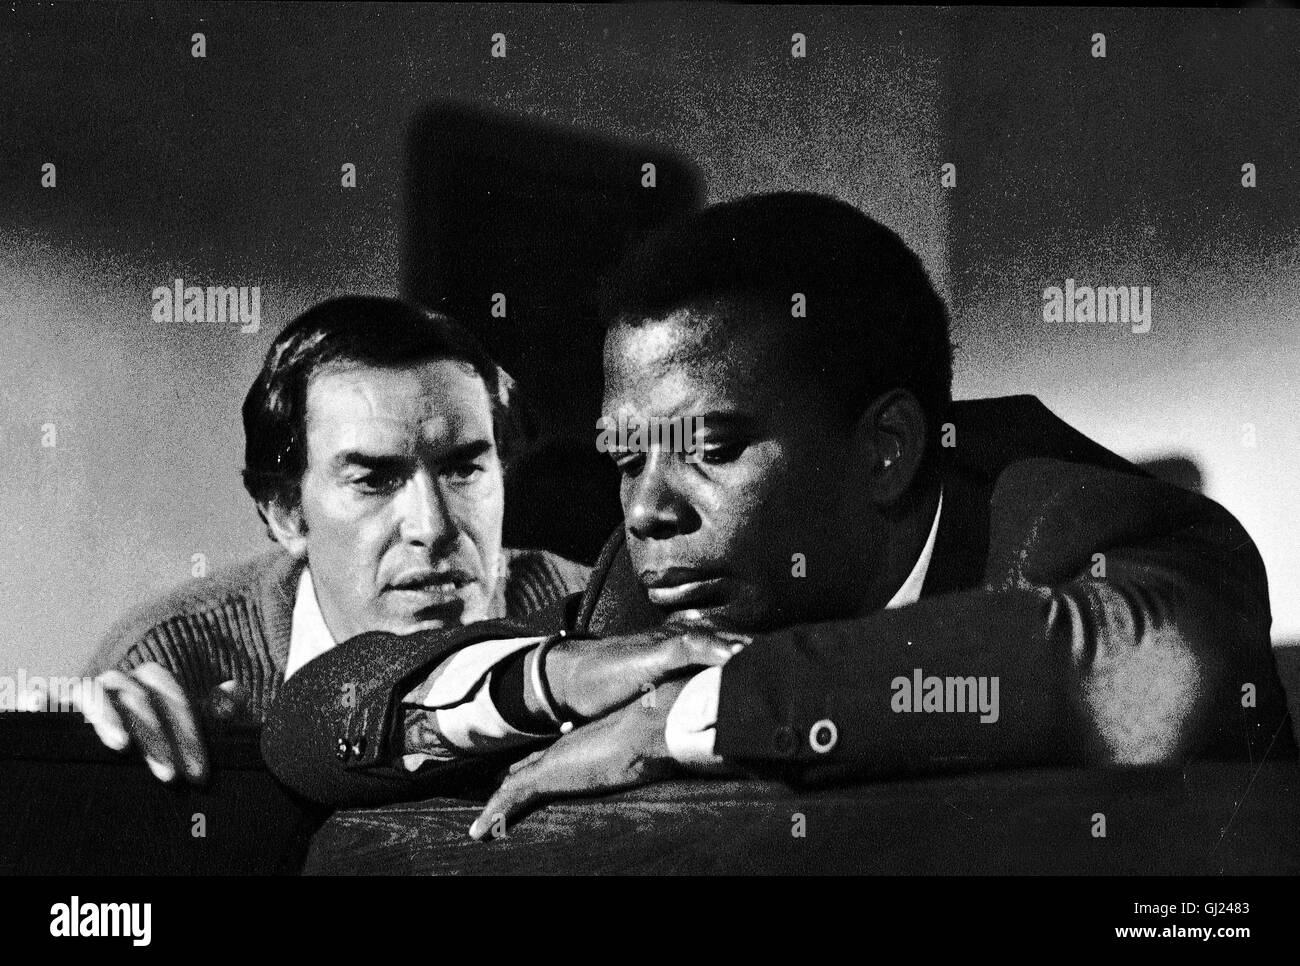 Prediger Len mister black and white stock photos images alamy